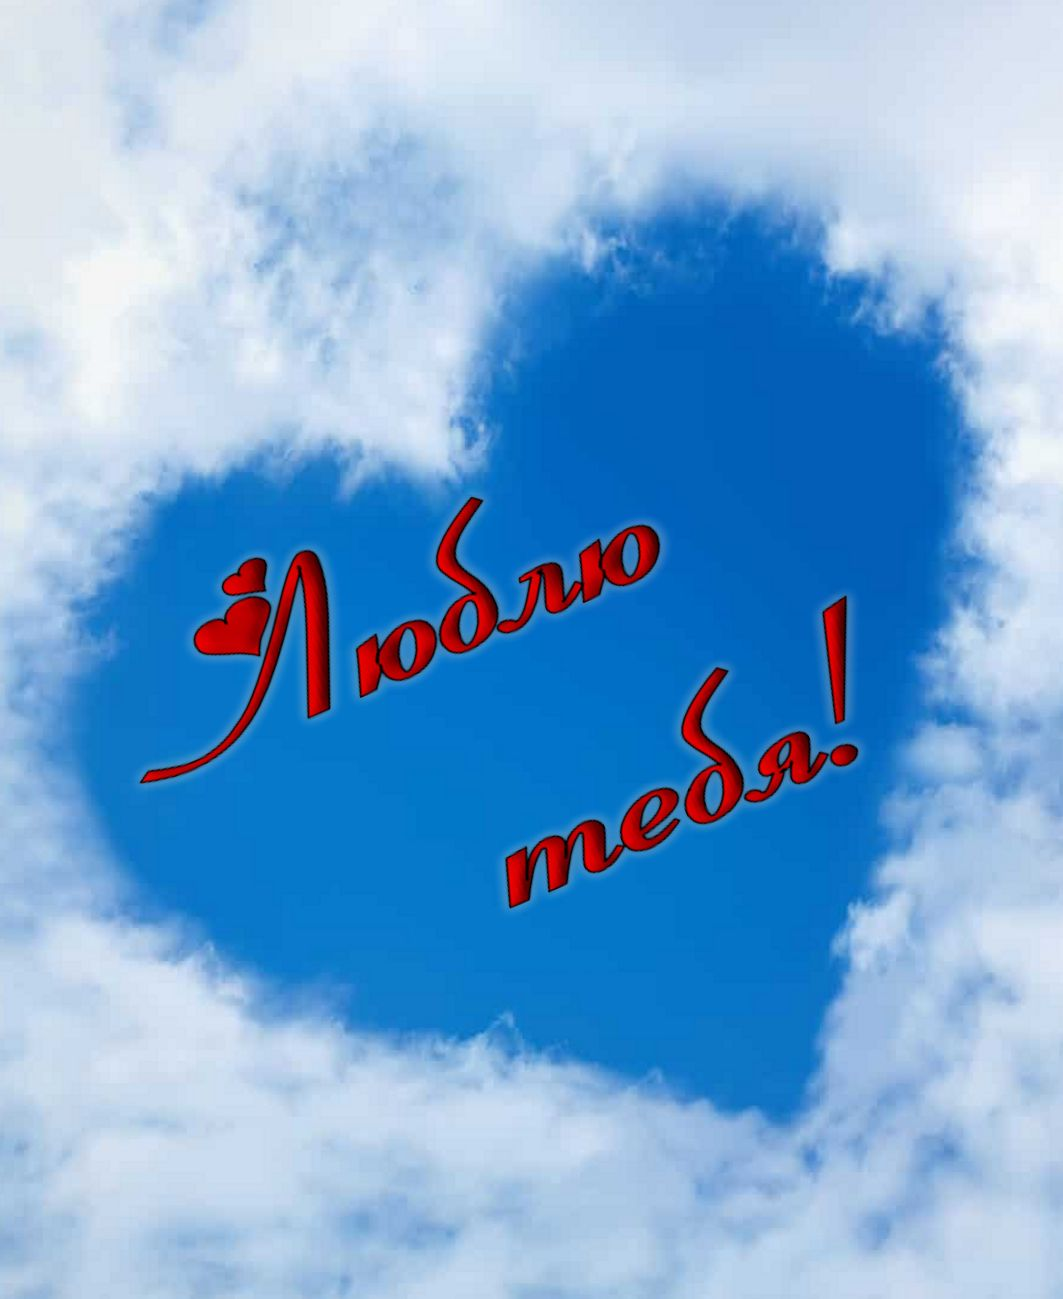 Открытка - люблю тебя внутри сердца в небе